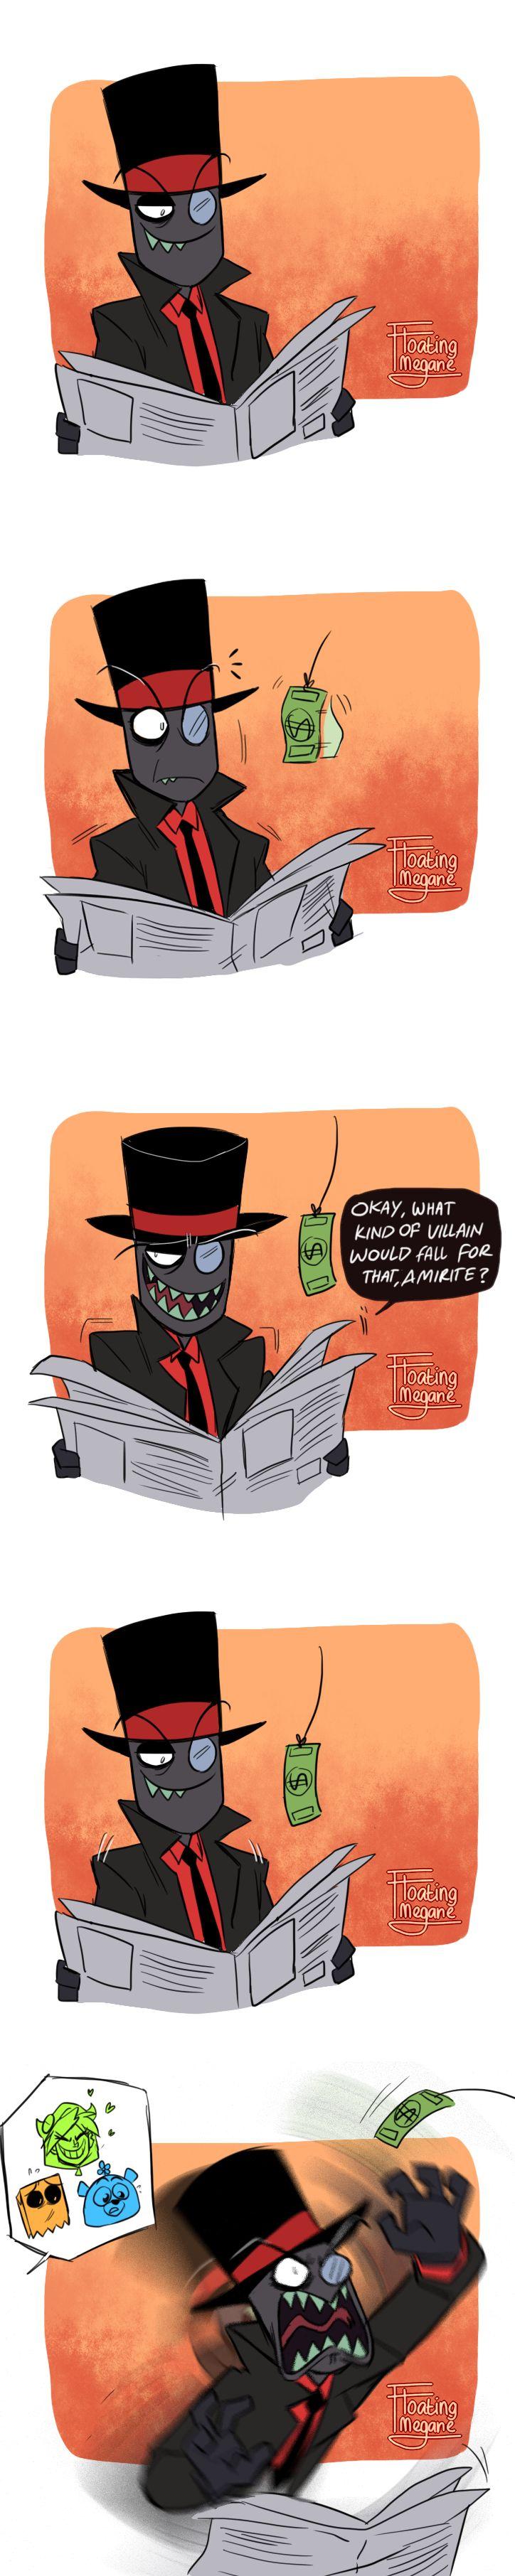 She wants the Big Black Hat | Villanos | Know Your Meme